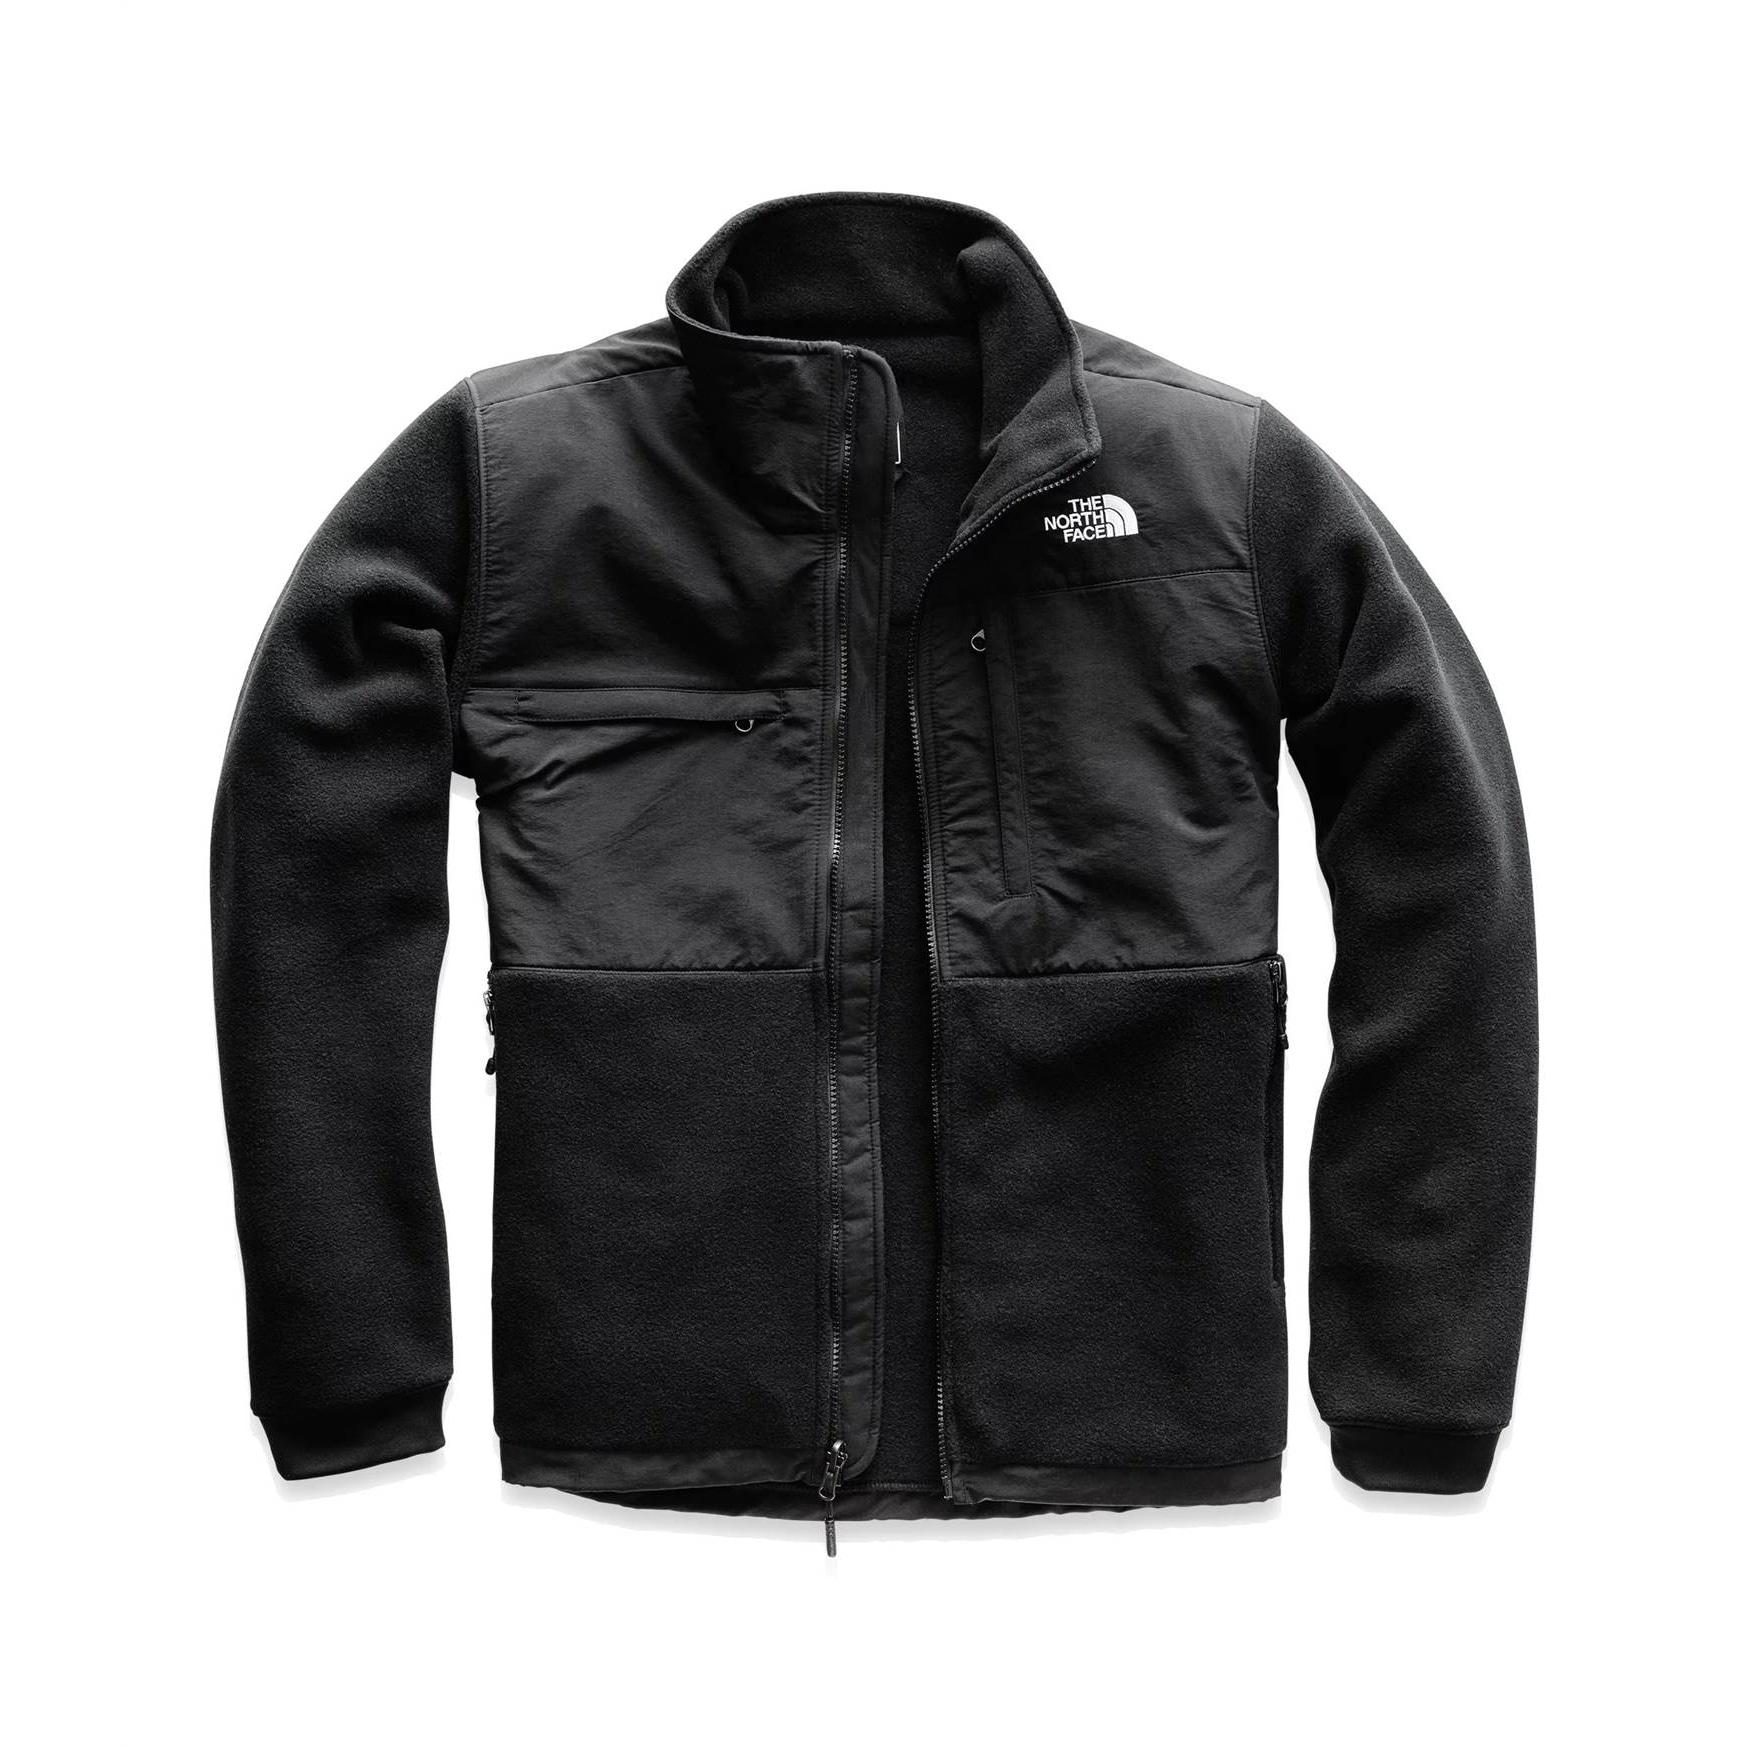 Denali 2 Jacket - Men's